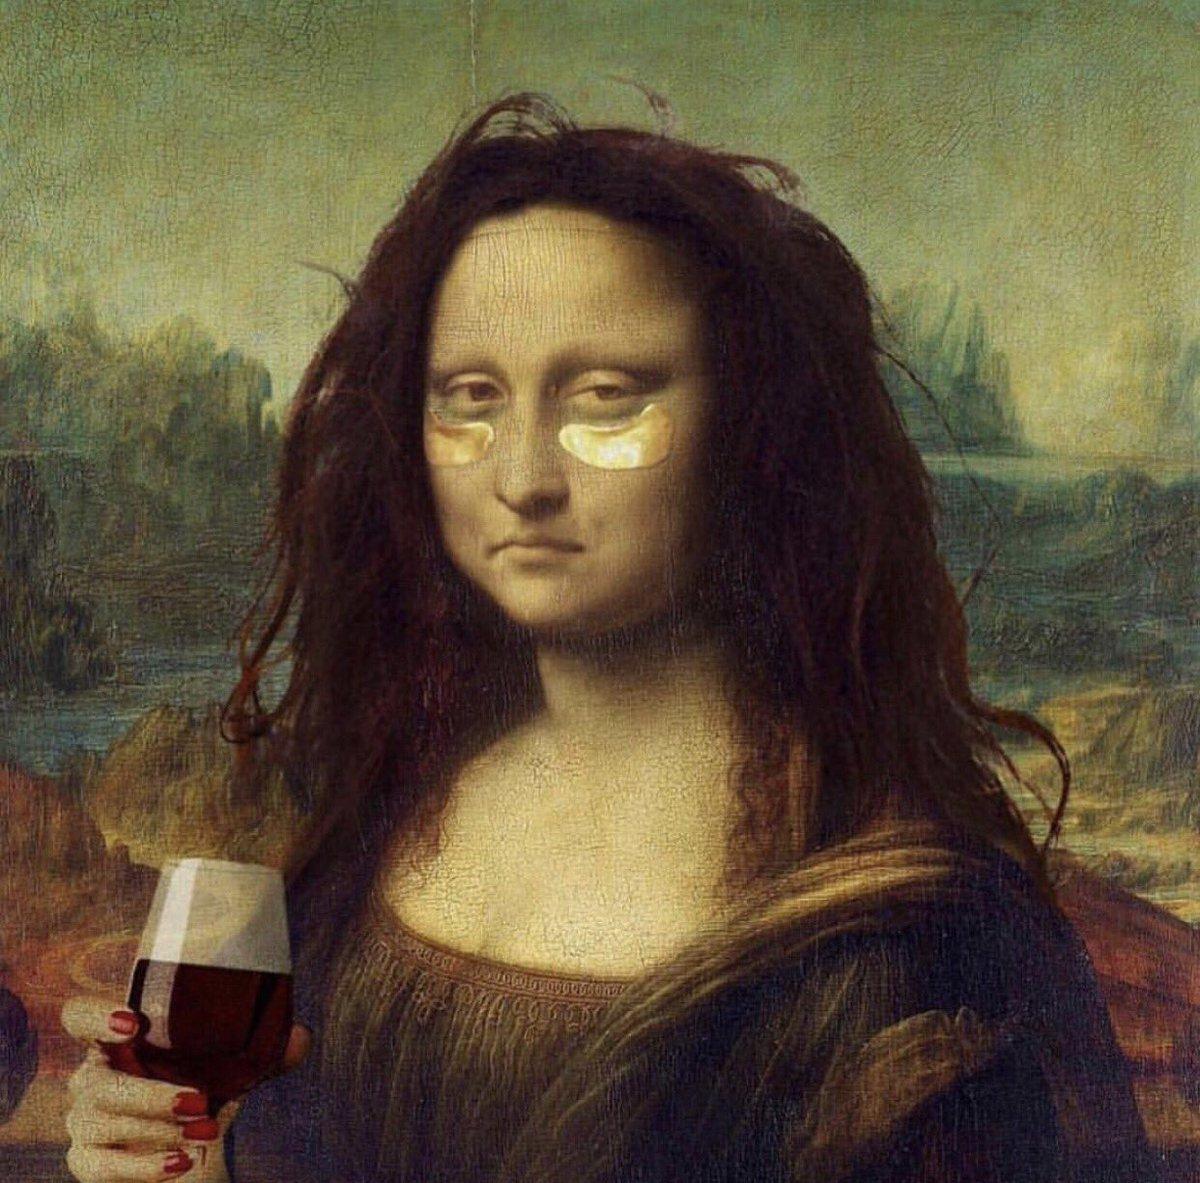 Monday Lisa gets it... #mondays ???? https://t.co/cbyxFqDHVT